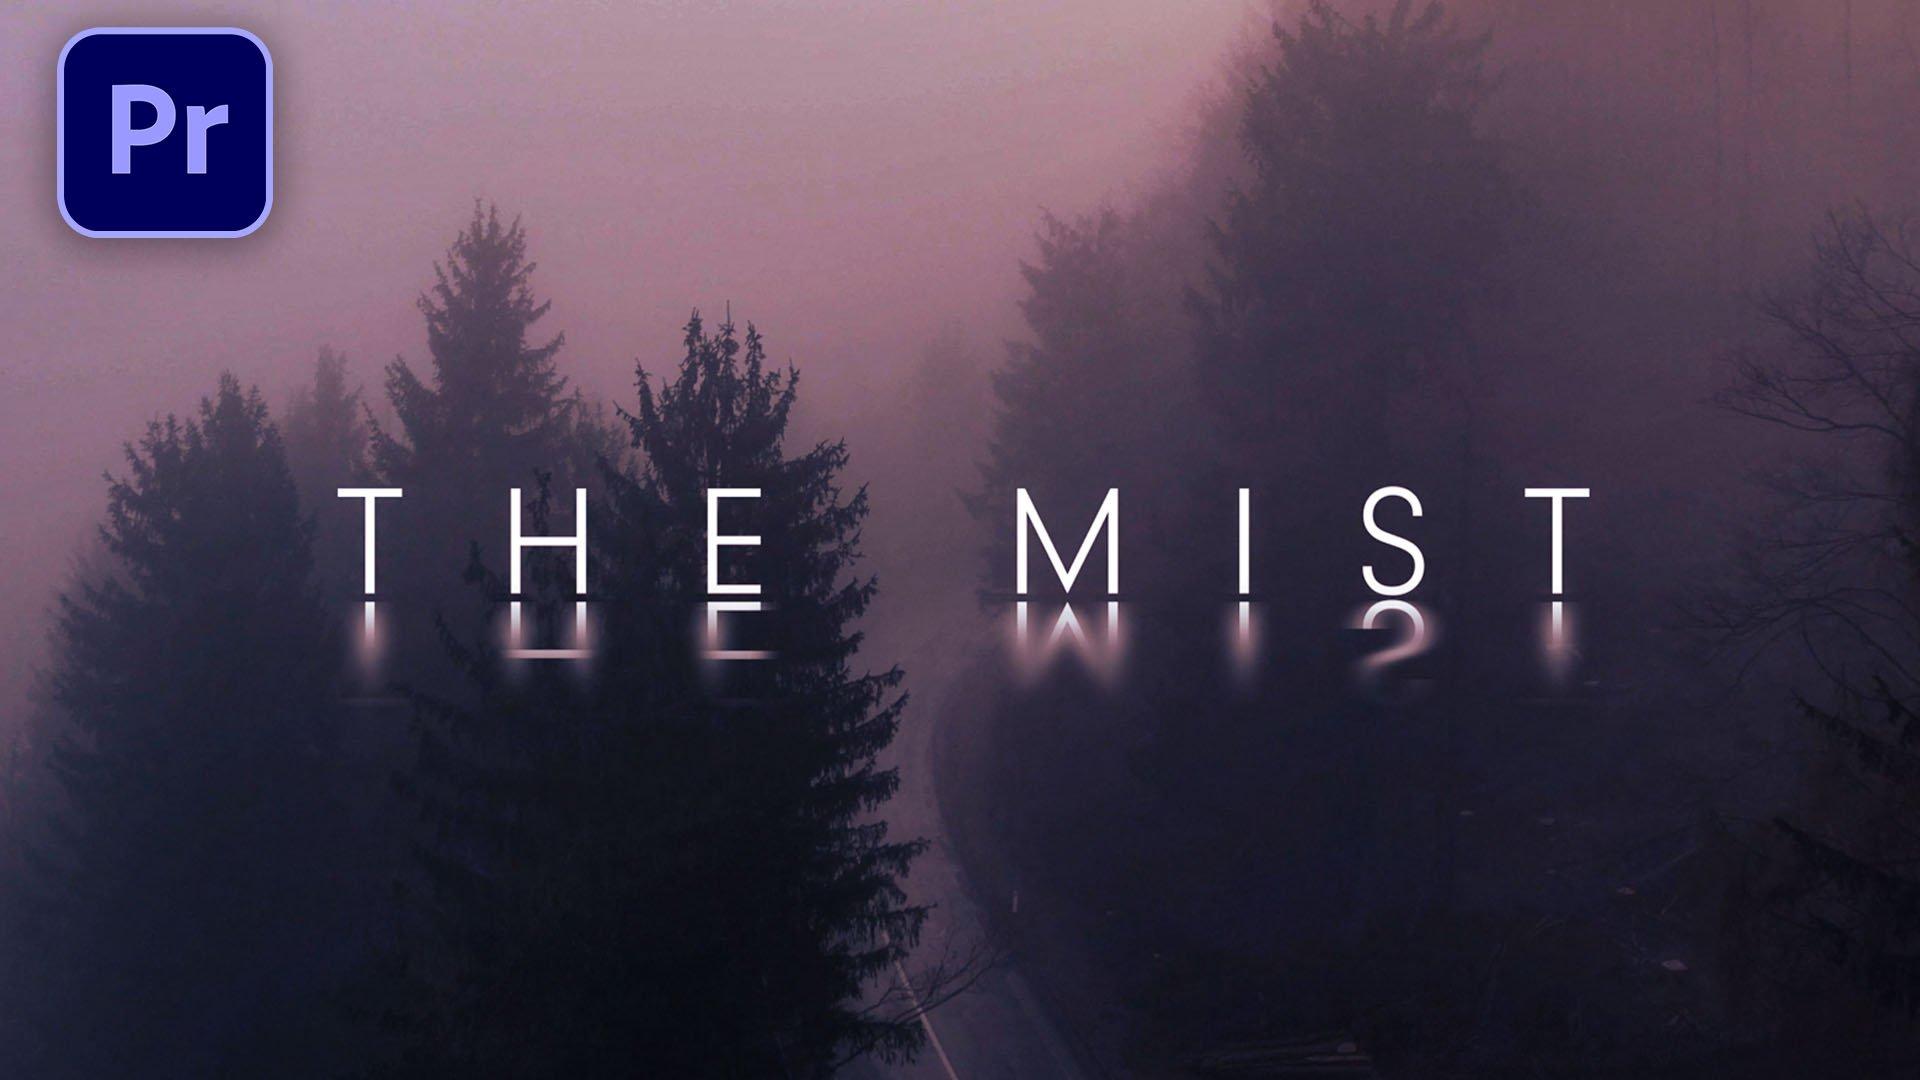 cinematic-title-reveal-premiere-pro-tutorial